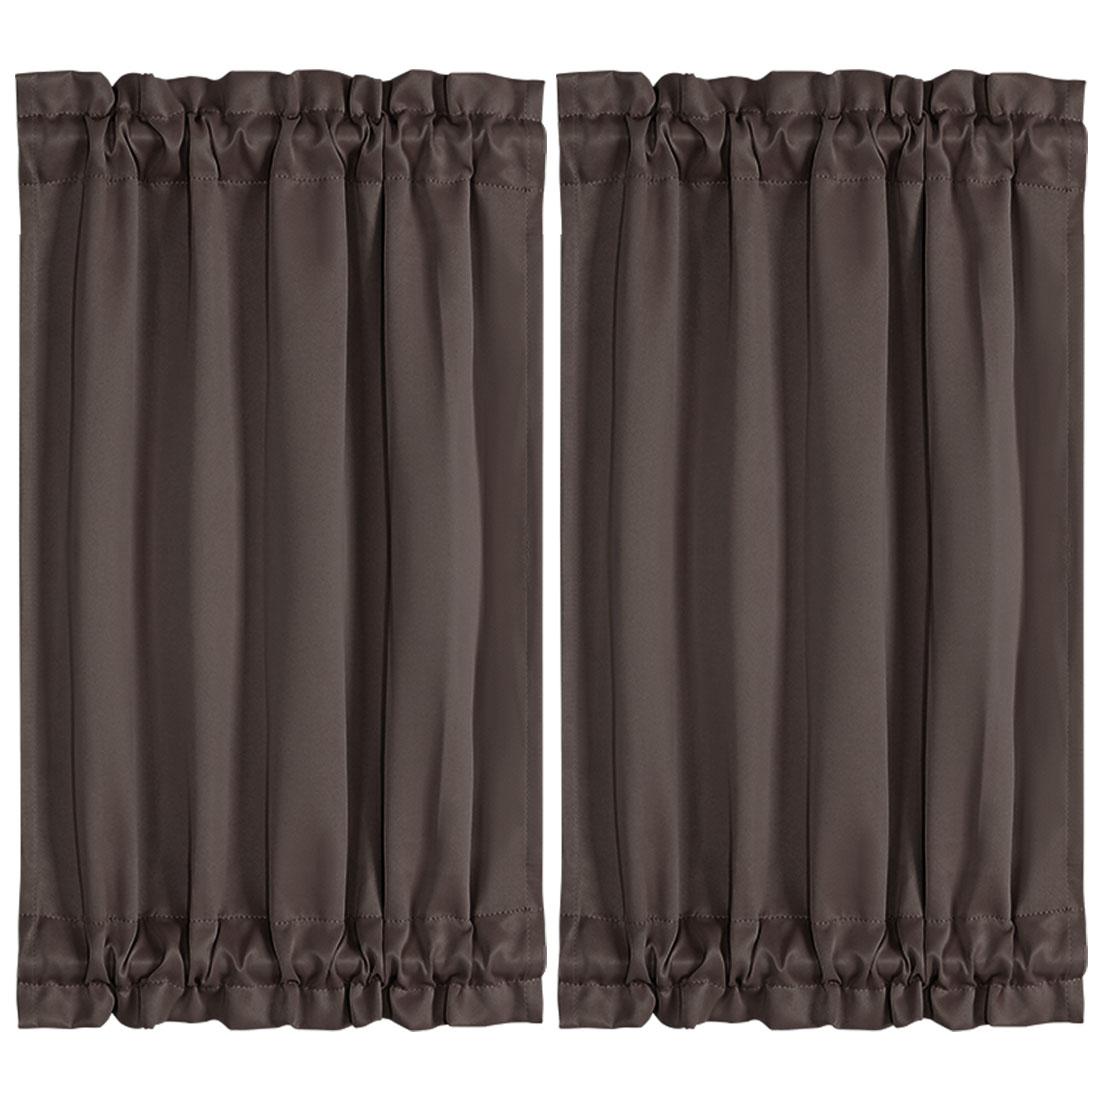 "2pcs Blackout Curtains Sliding Door Panel Darkening Drape Coffee Color 25"" x 40"""